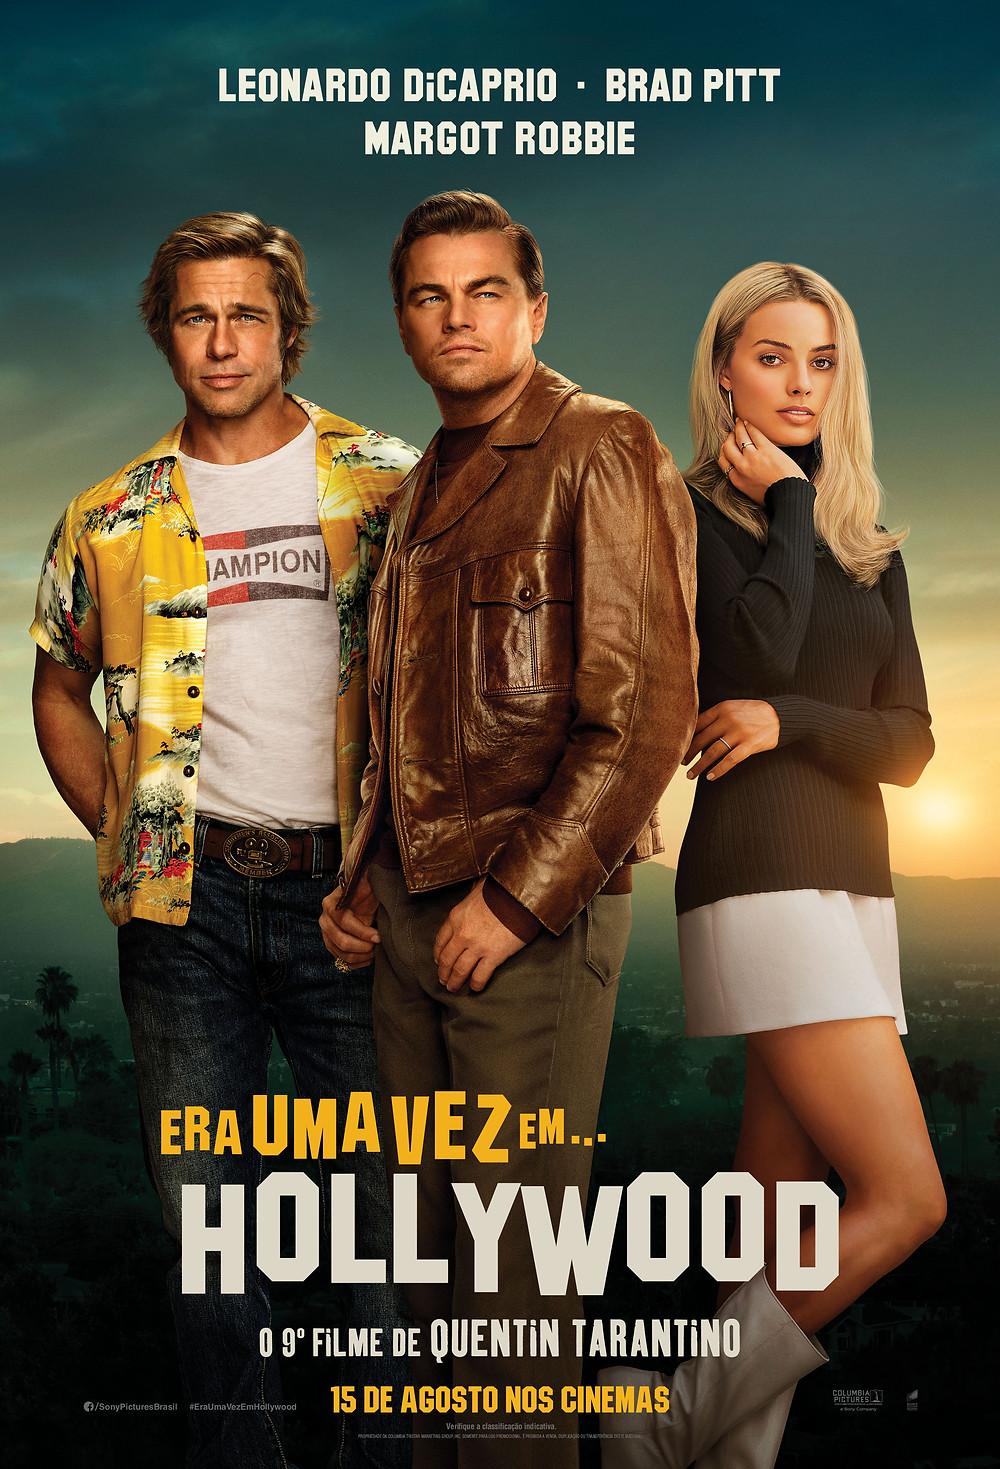 Era Uma Vez Em...Hollywood (Once Upon A Time In...Hollywood: 2019)